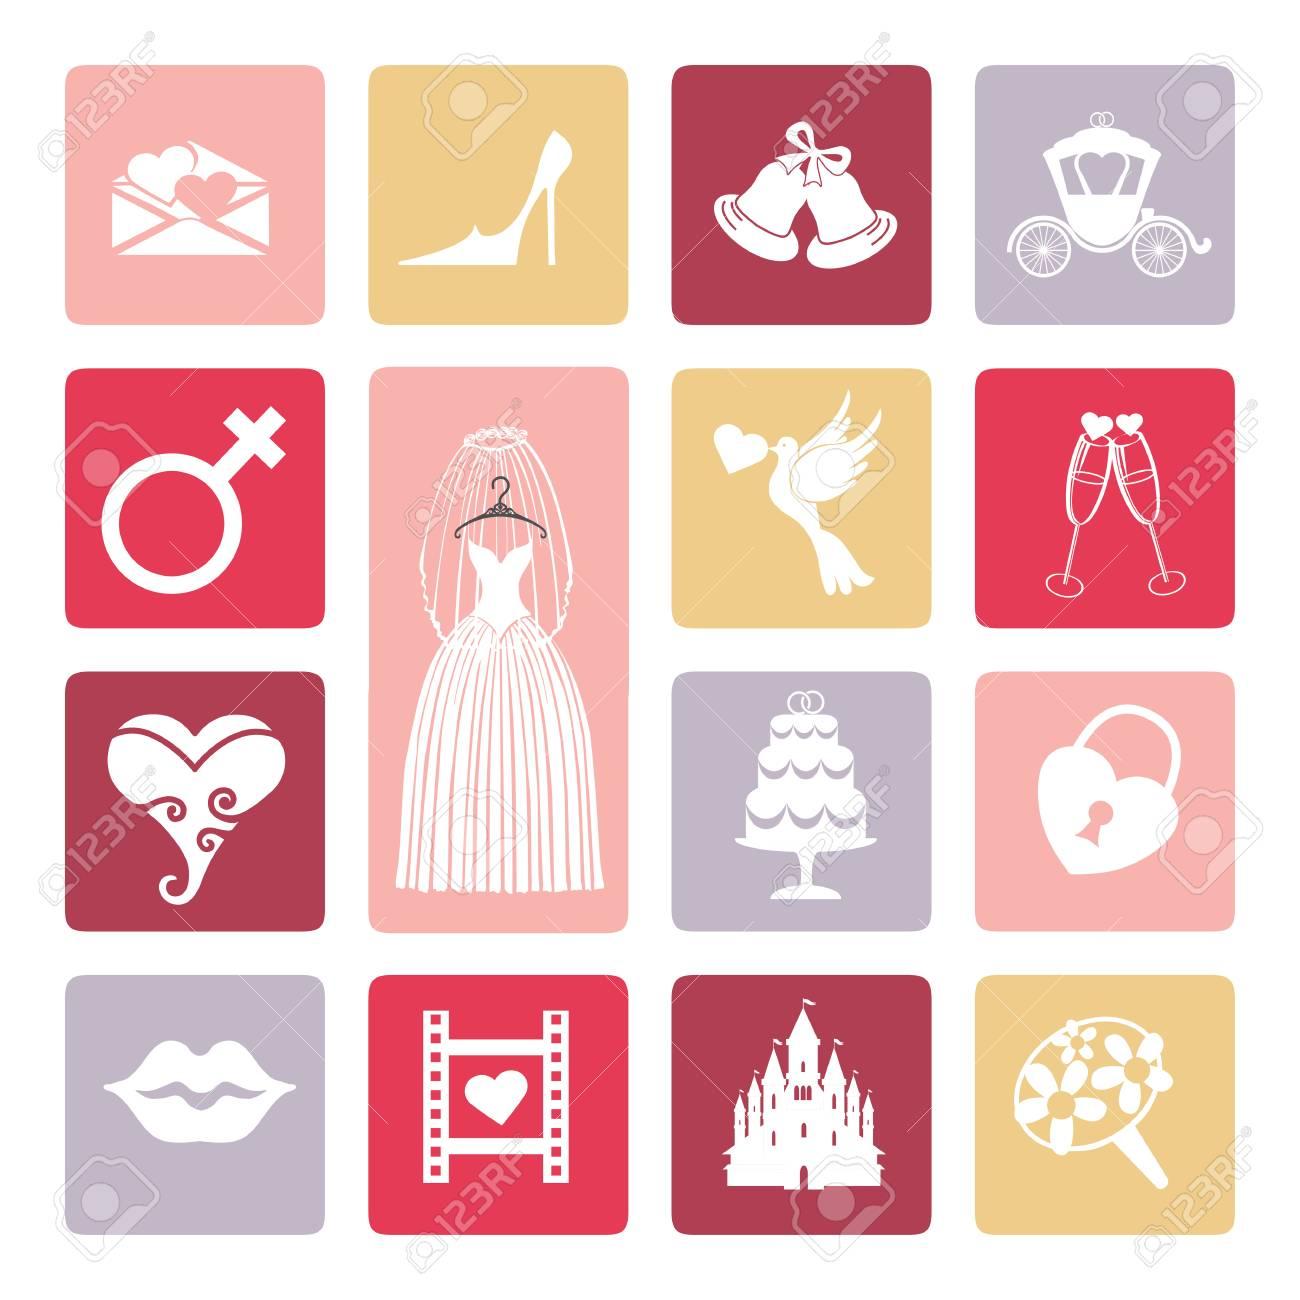 vector wedding icons set flat icons for bridebridal shower